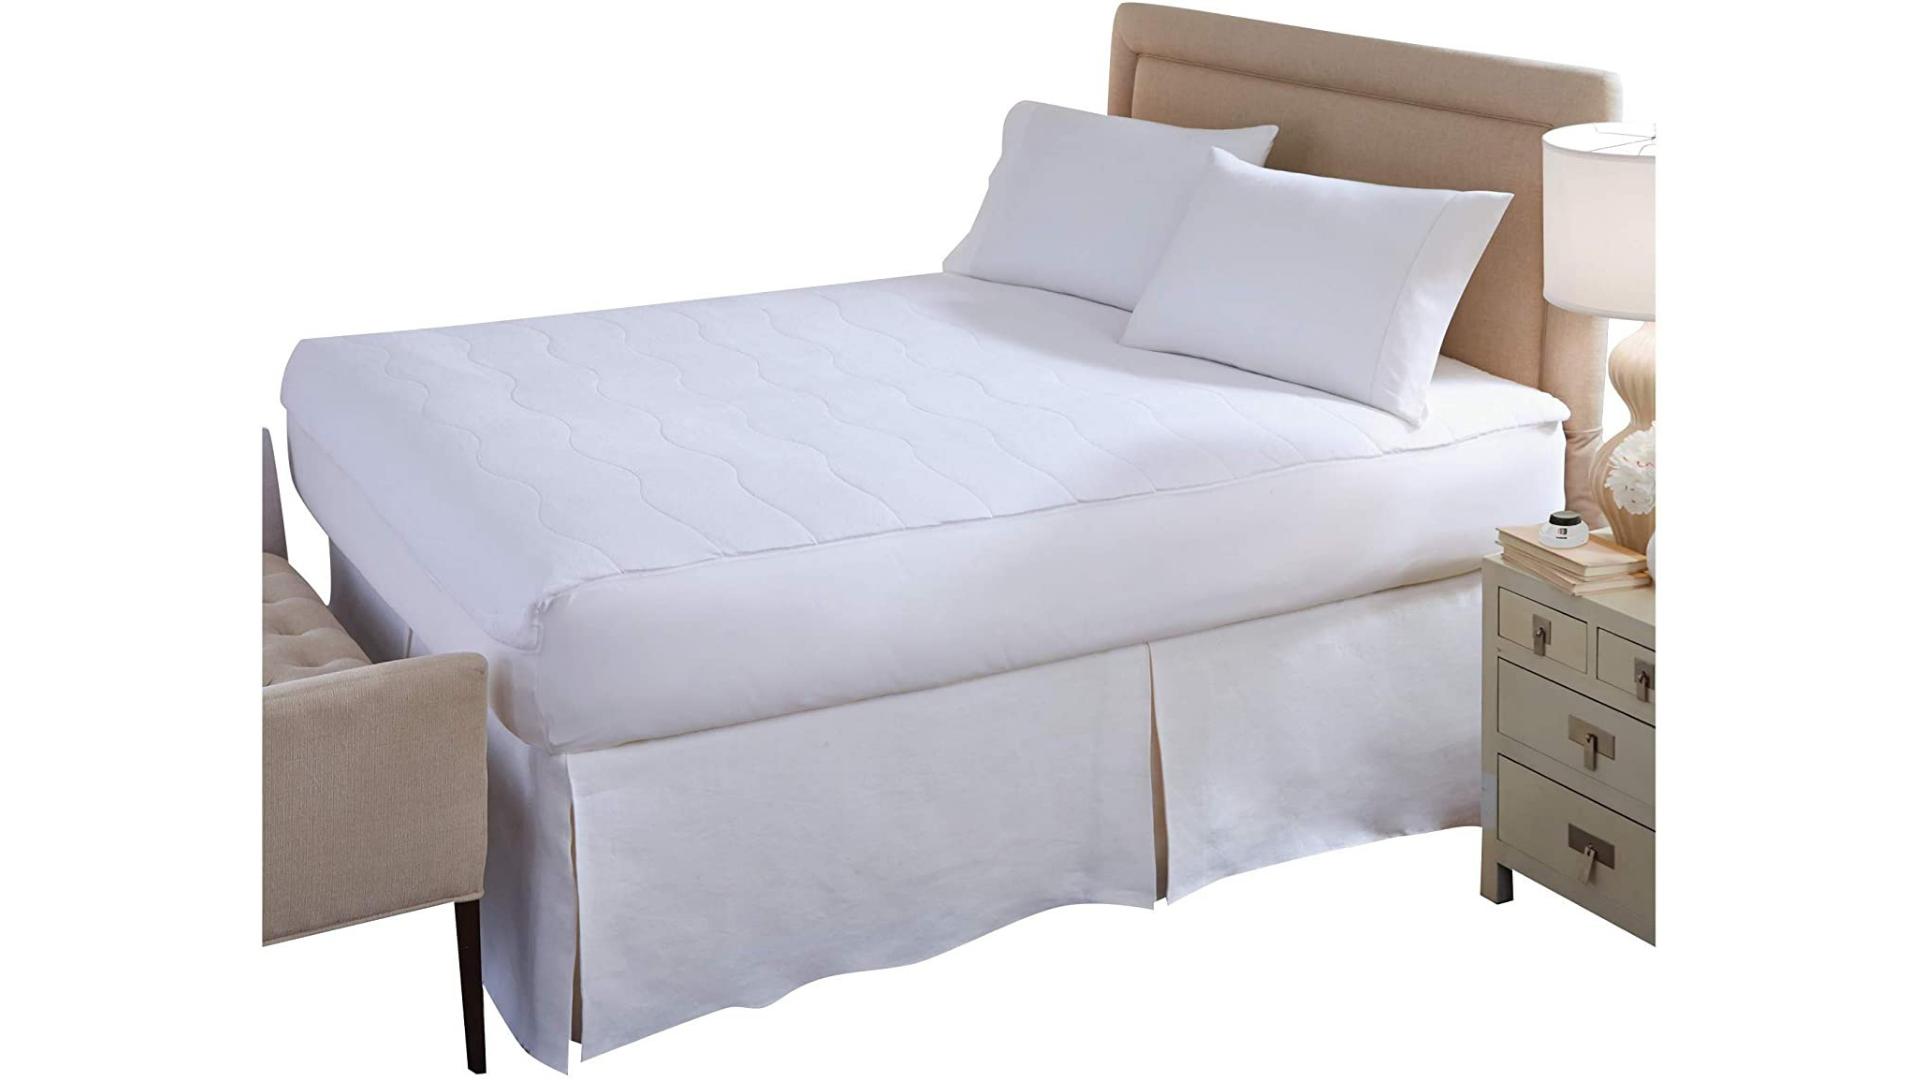 Perfect Fit SoftHeat best heated mattress pad